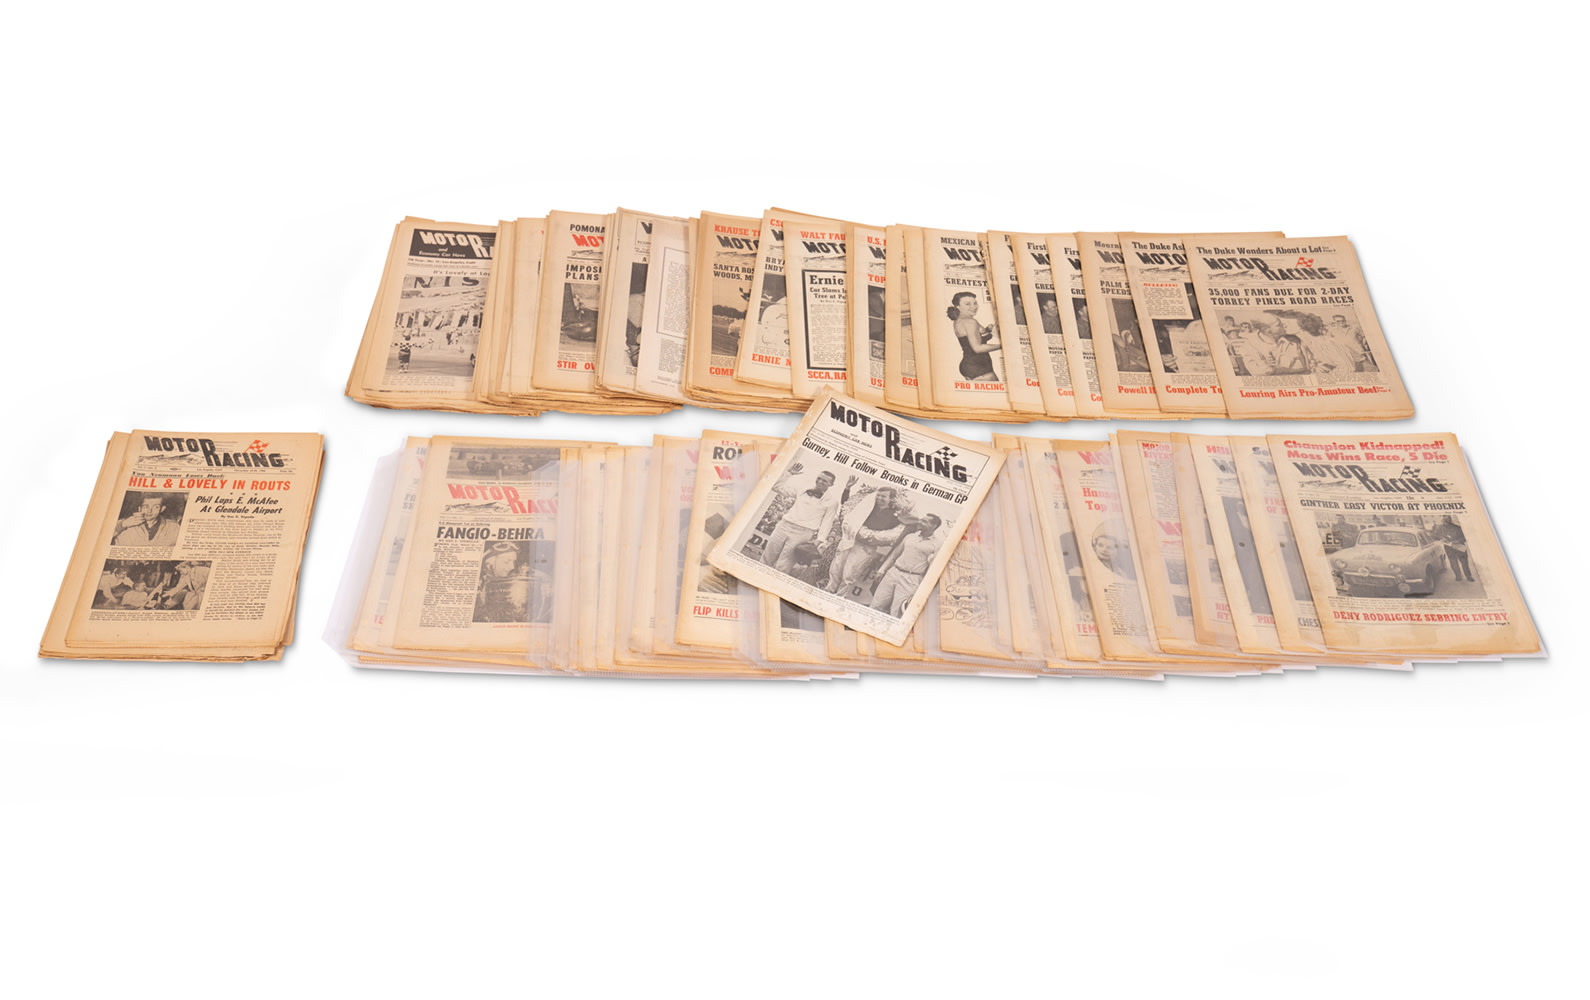 Assorted Motor Racing Newsletters, 1955–1962